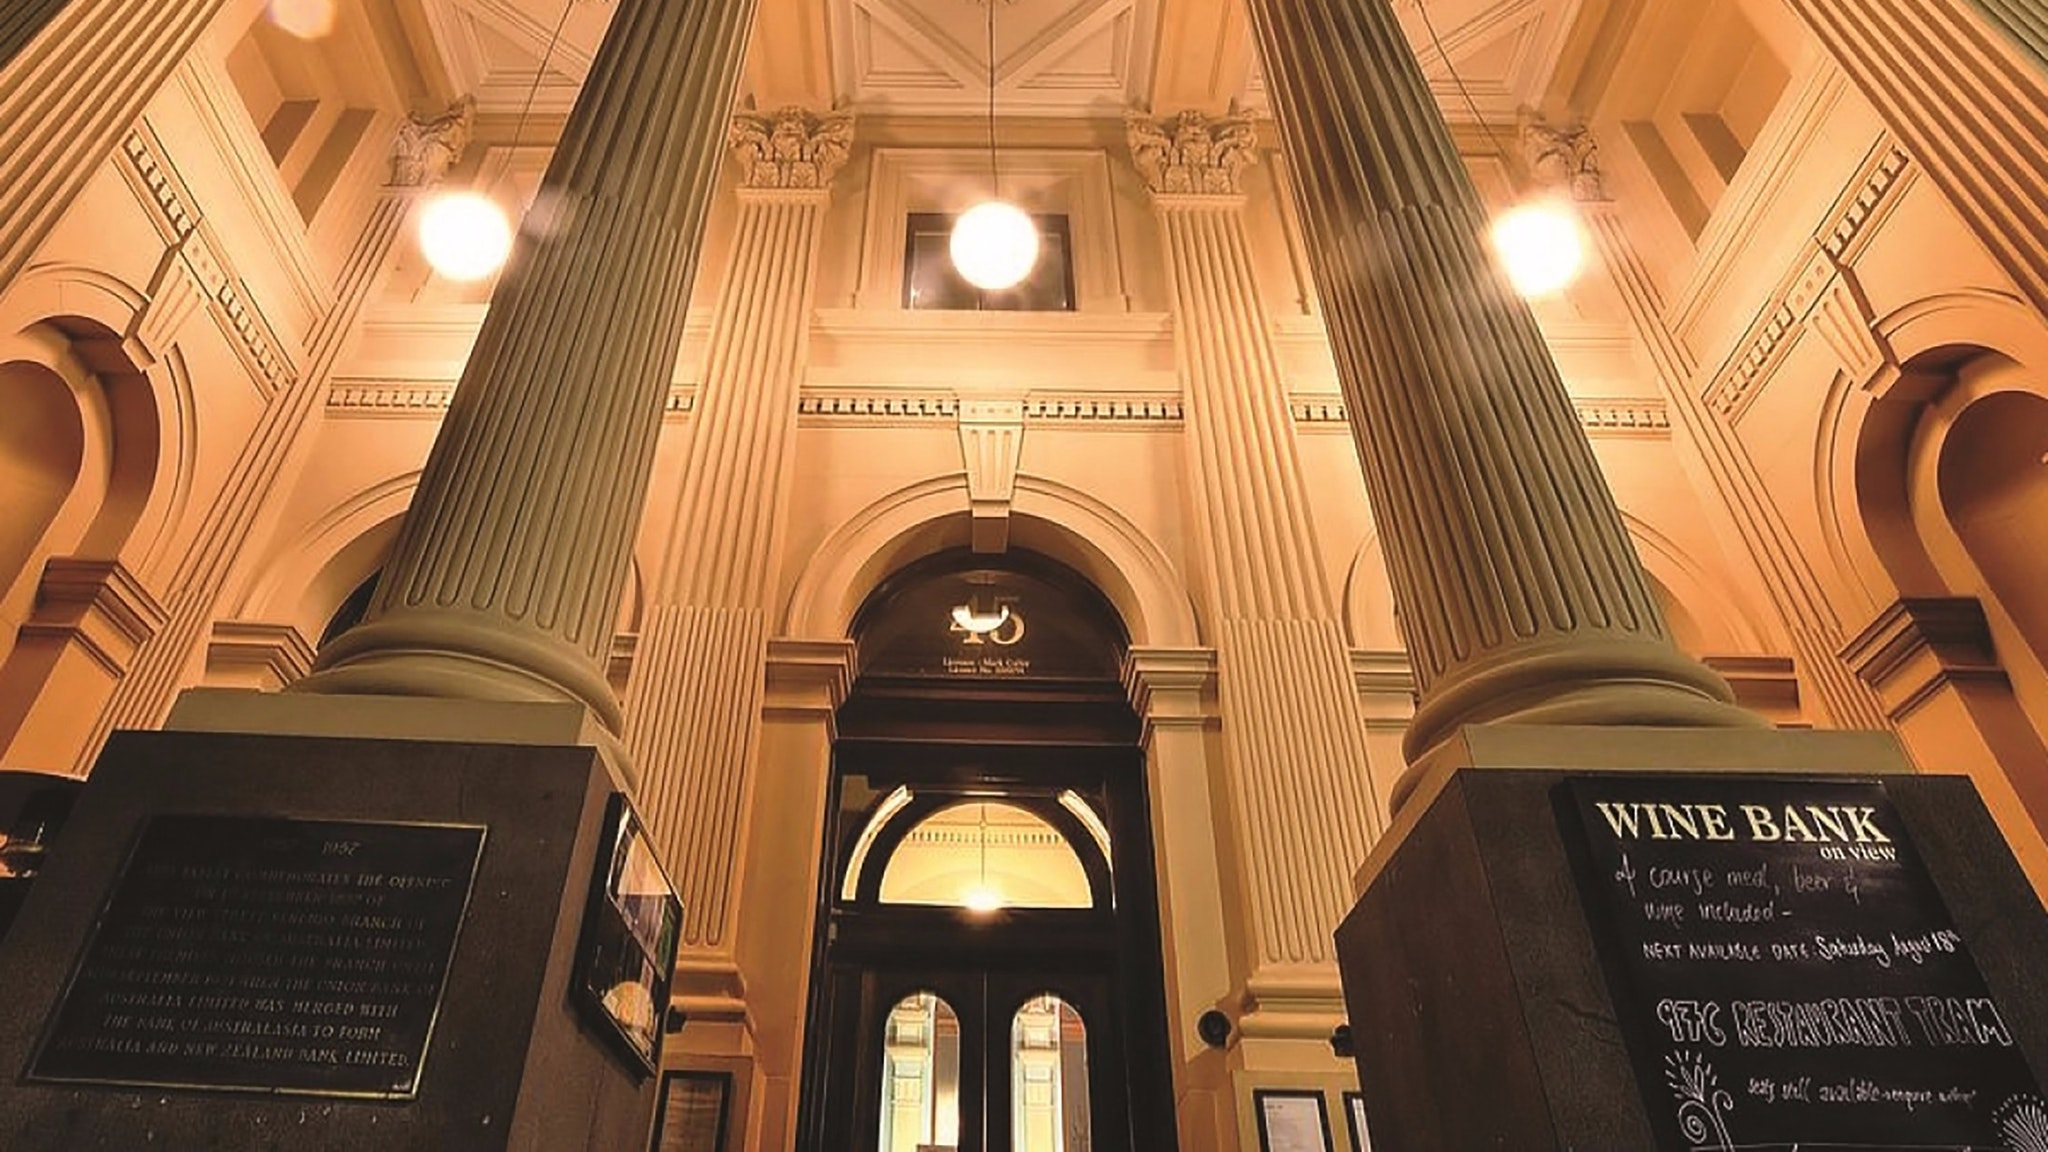 Wine Bank entrance